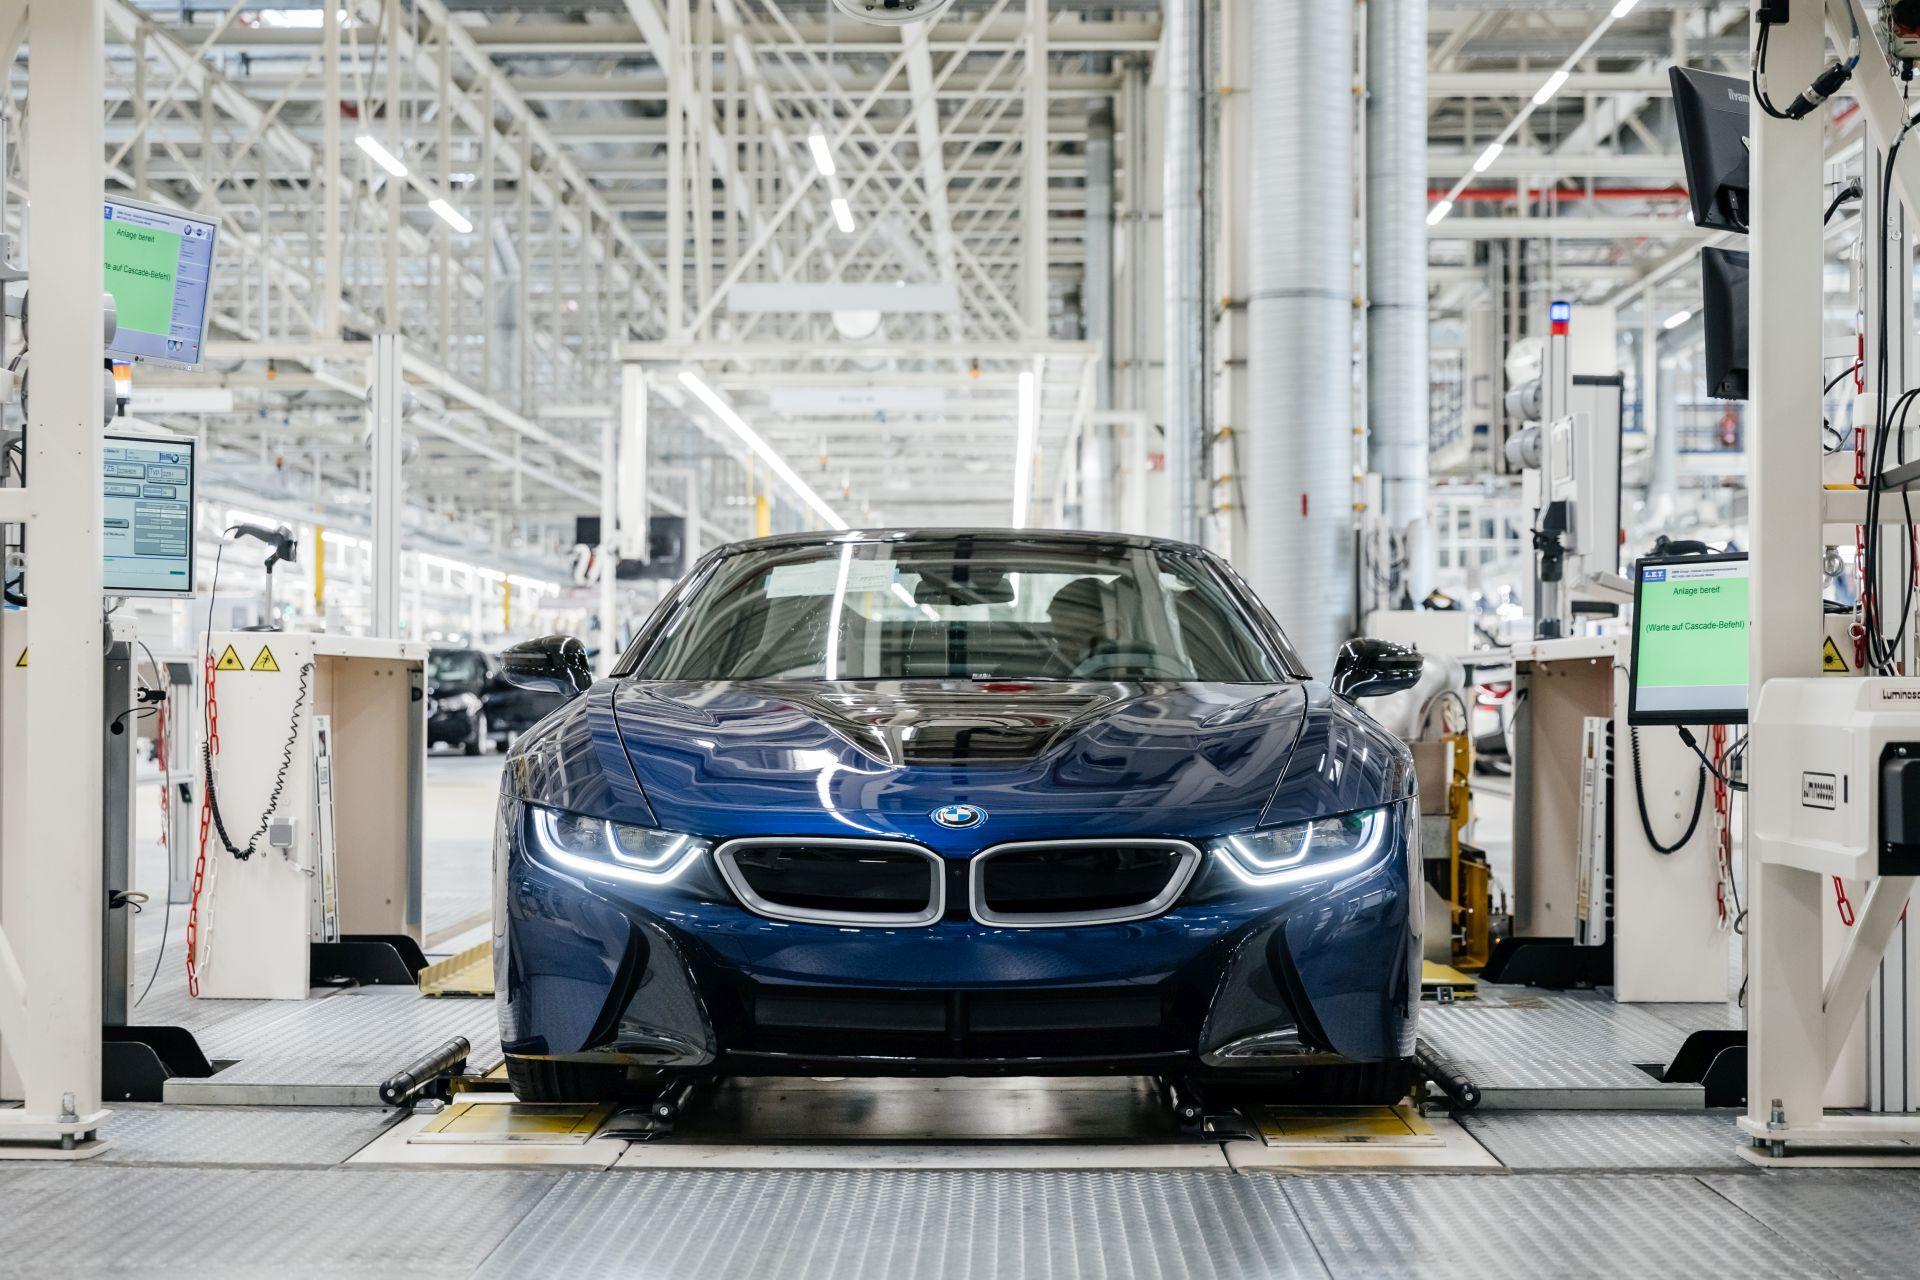 Final BMW i8 Models 54